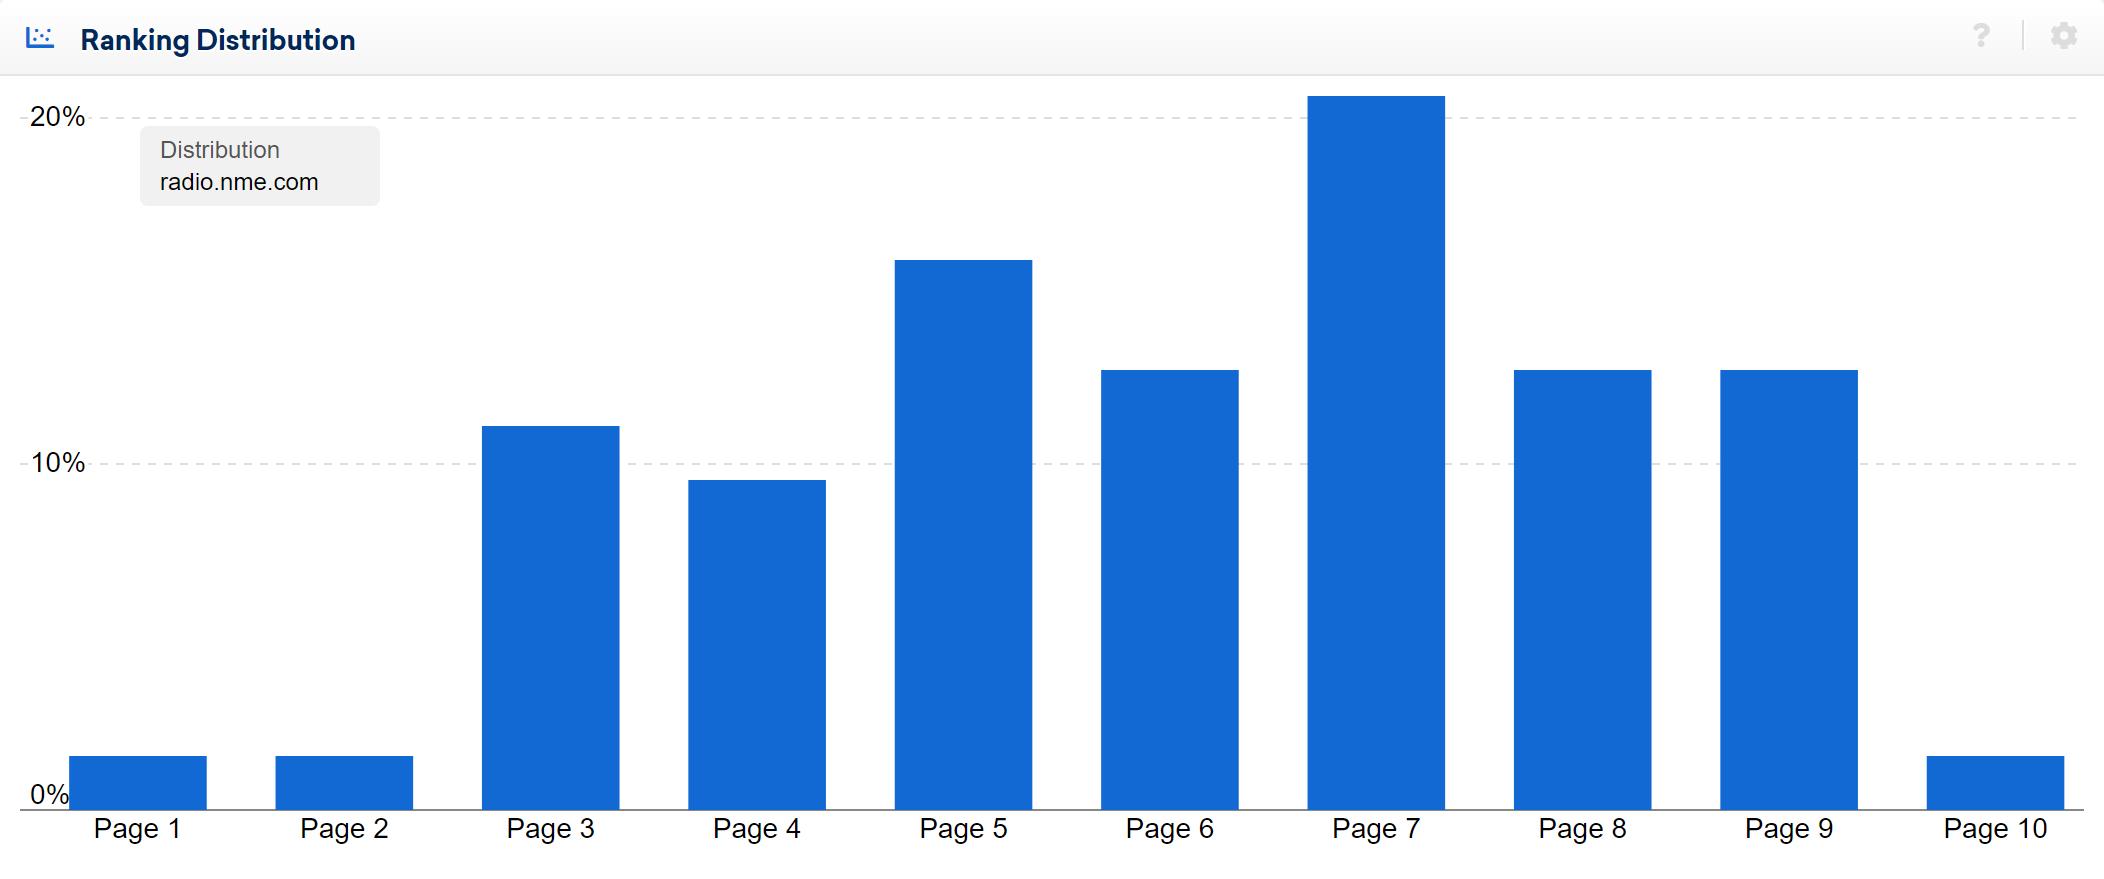 hostname radio.nme.com poor ranking distribution